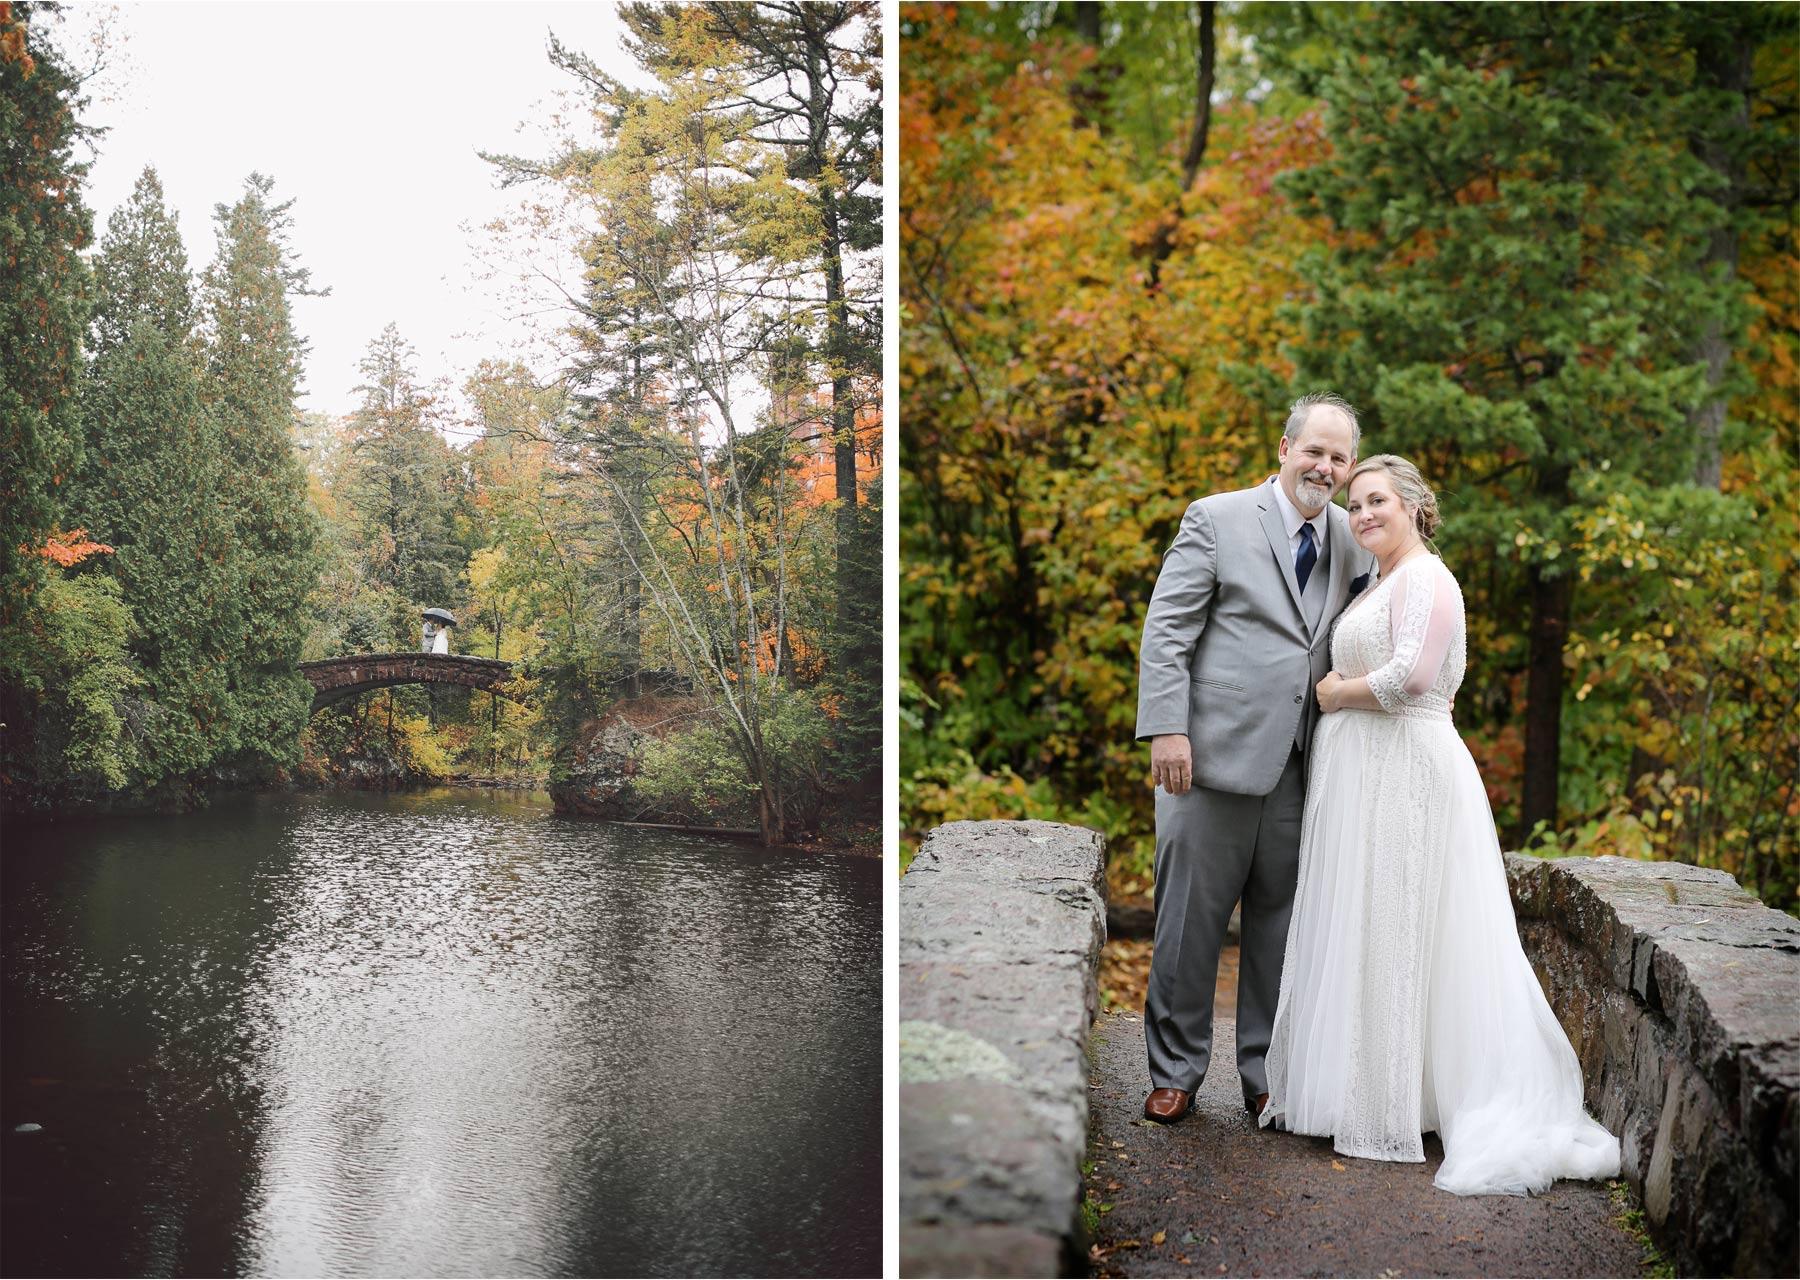 03-Duluth-Minnesota-Wedding-Photography-by-Vick-Photography-Glensheen-Mansion-Rain-Umbrella-First-Look-Autumn-Fall-Kelli-and-Marc.jpg